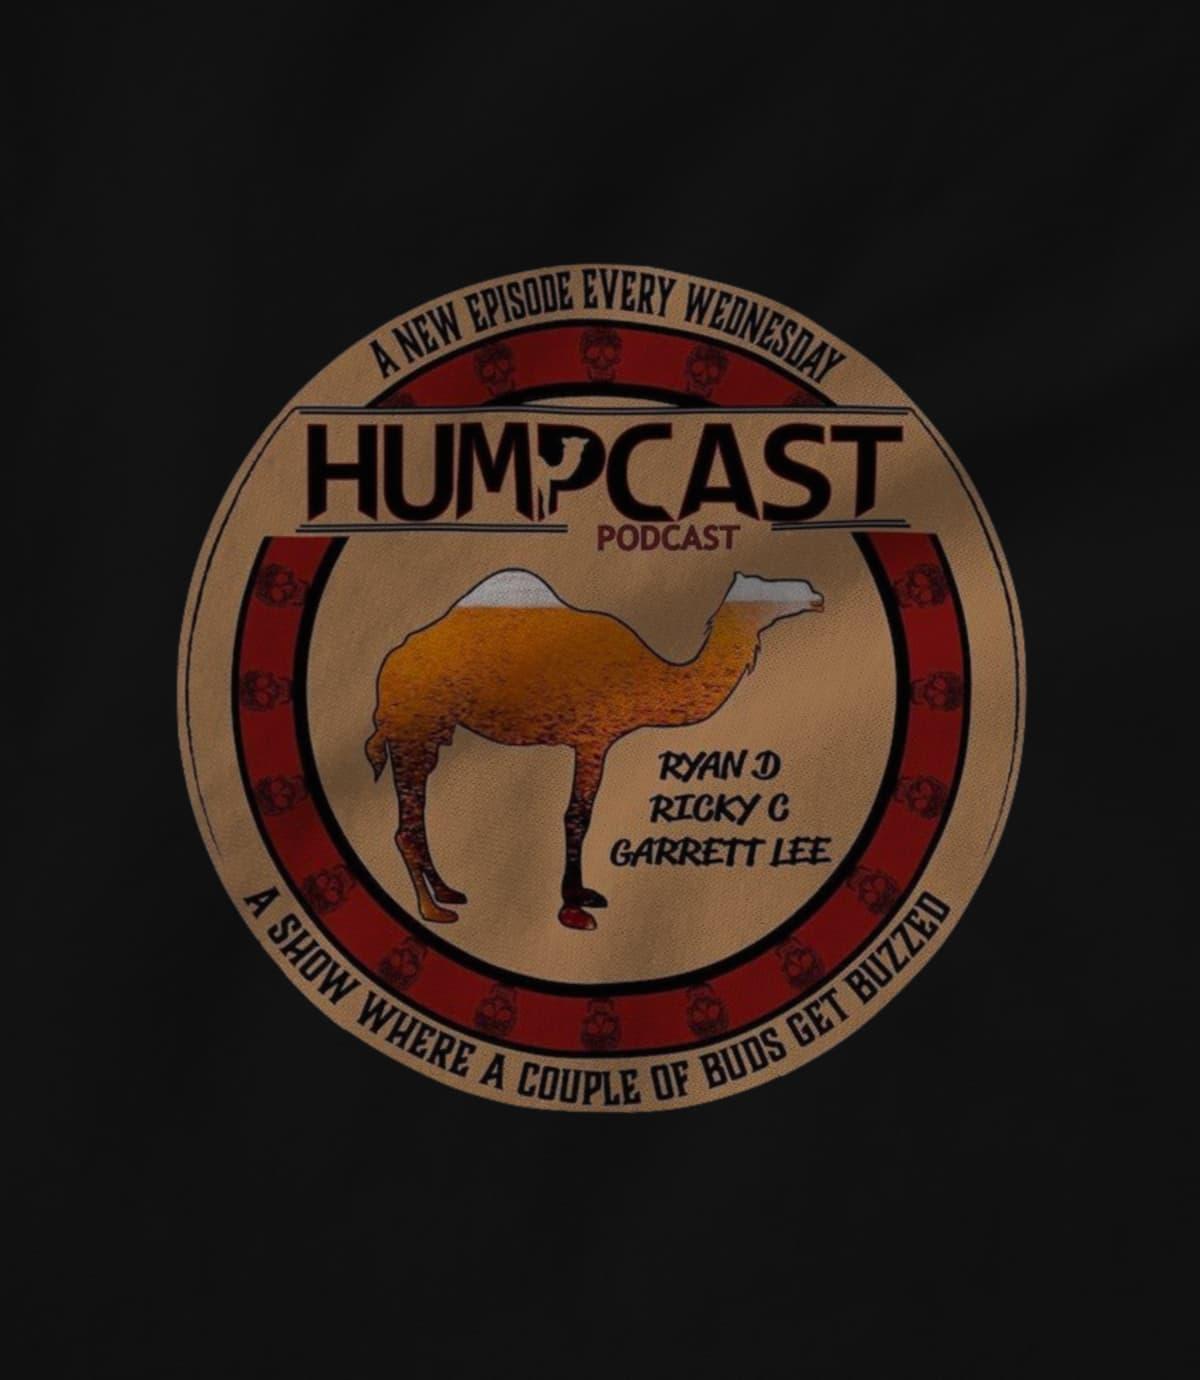 Famcast Media Podcast Network